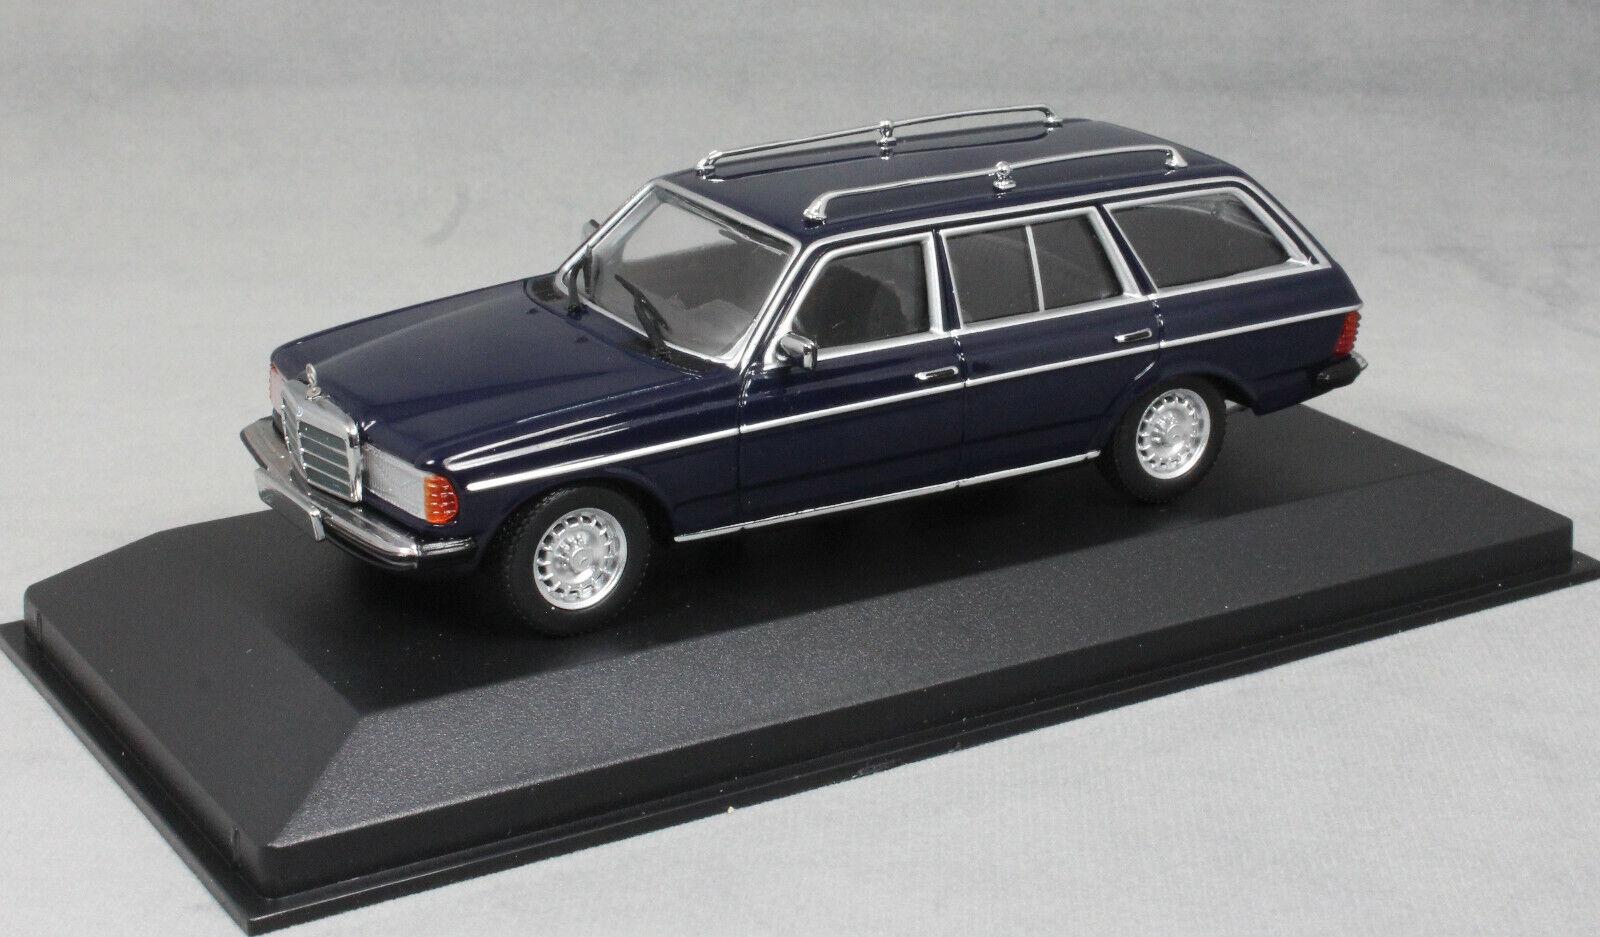 Minichamps maxichamps Mercedes-Benz 230TE W123 in Blu 1982 940032211 1 43 NUOVI